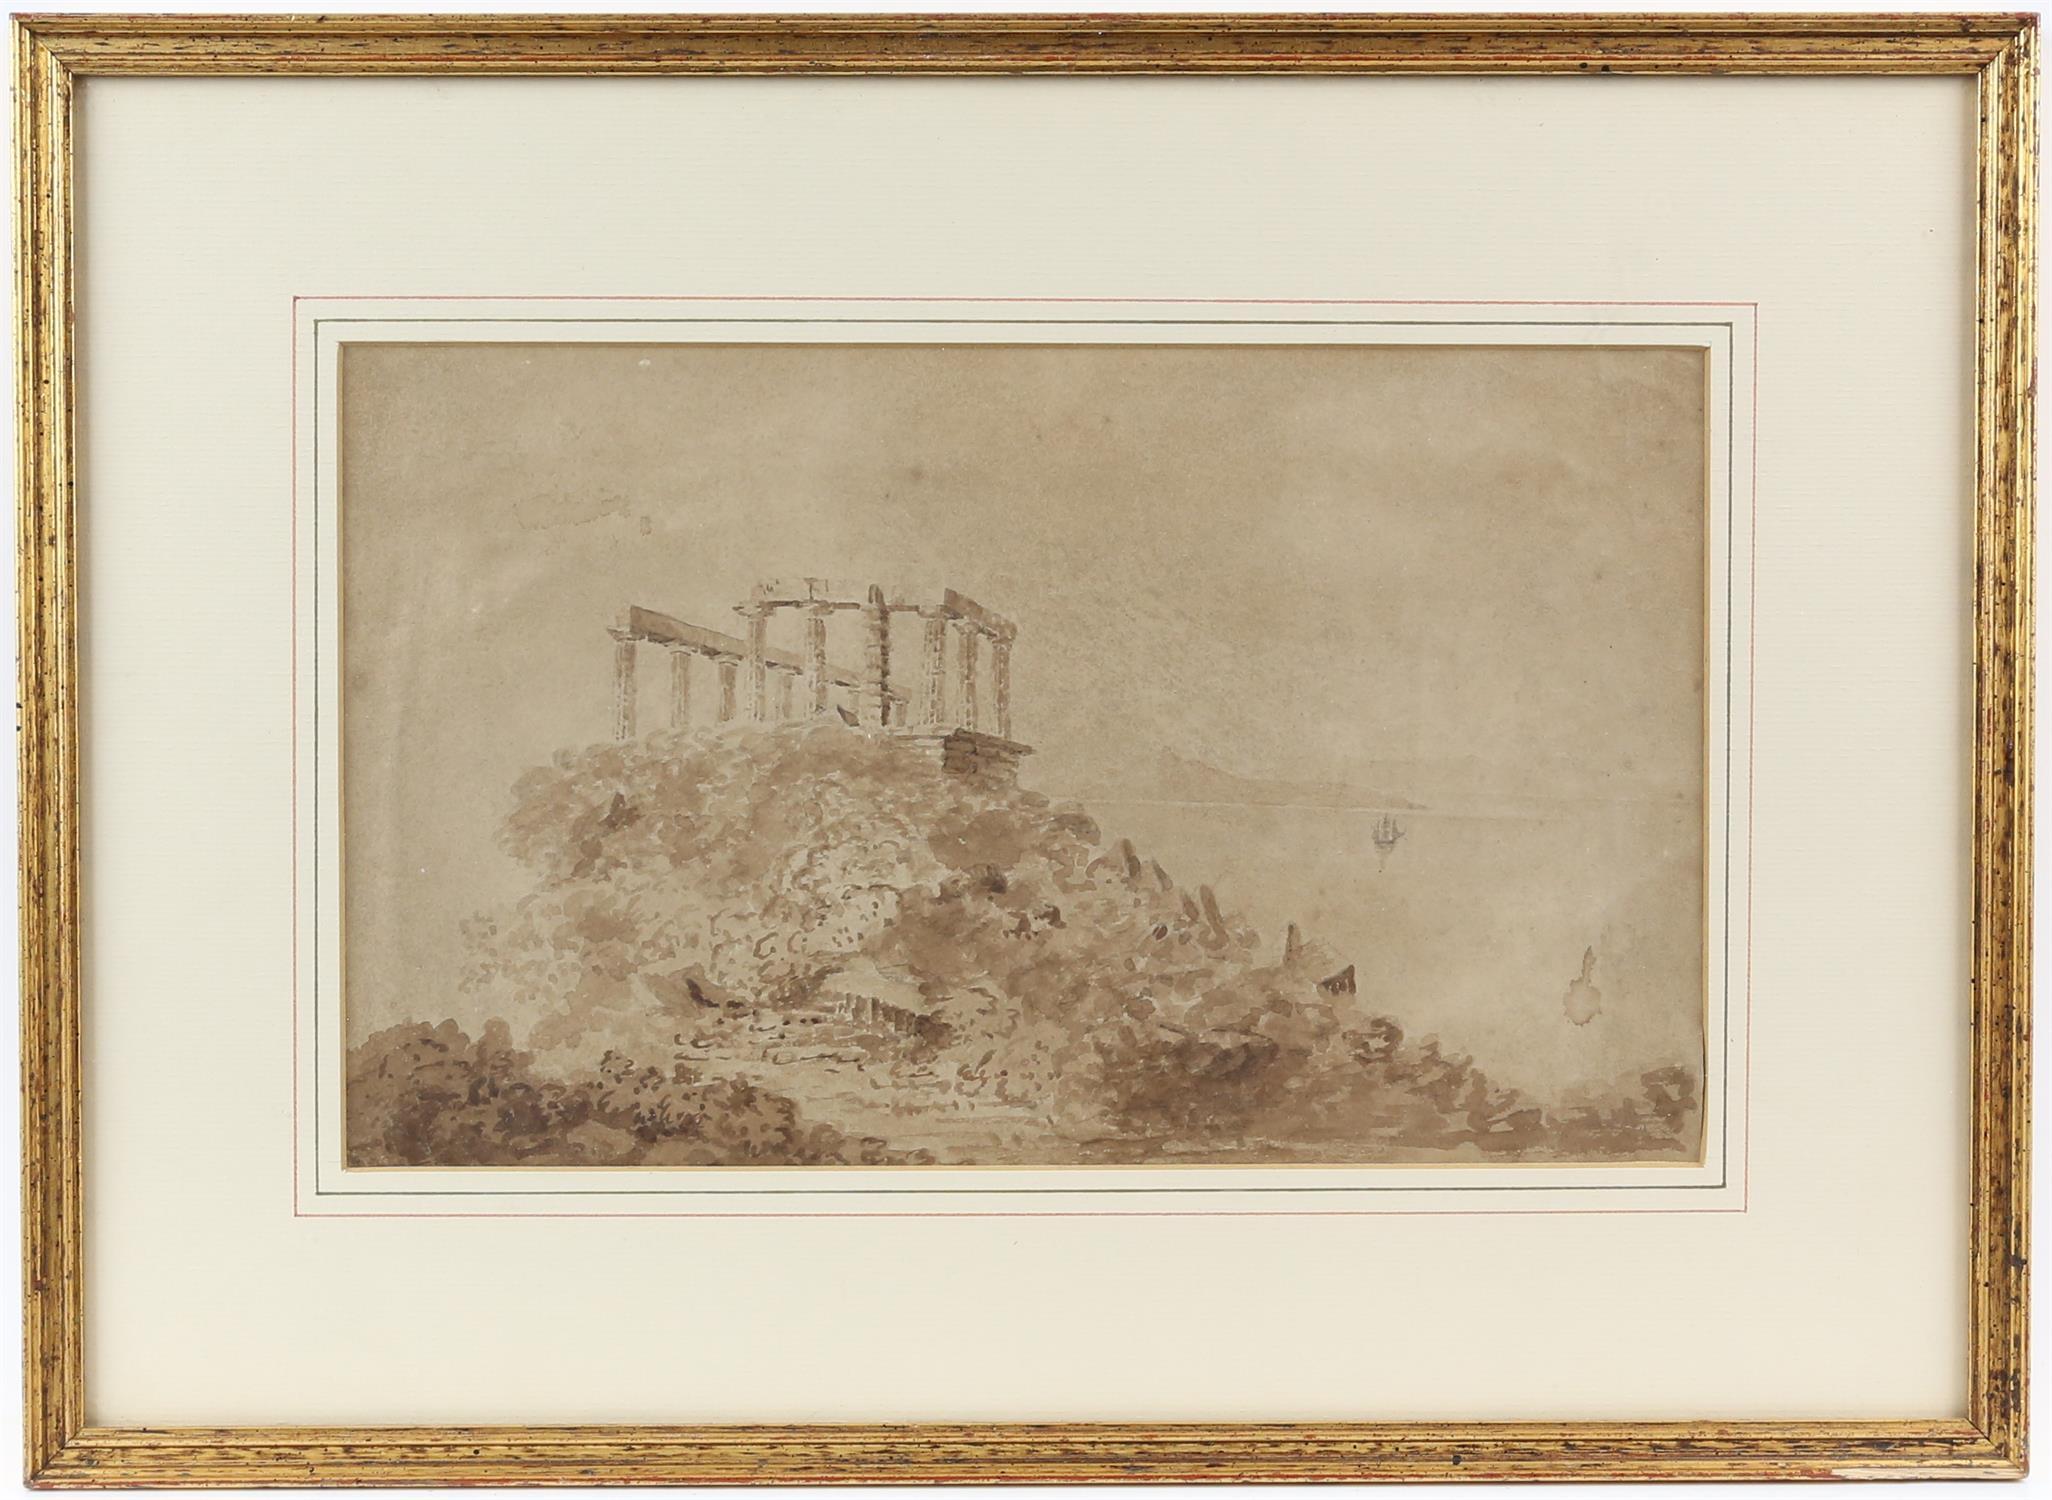 19th century English School, temple of Poseidon, sepia wash, 18cm x 30cm, - Image 2 of 3